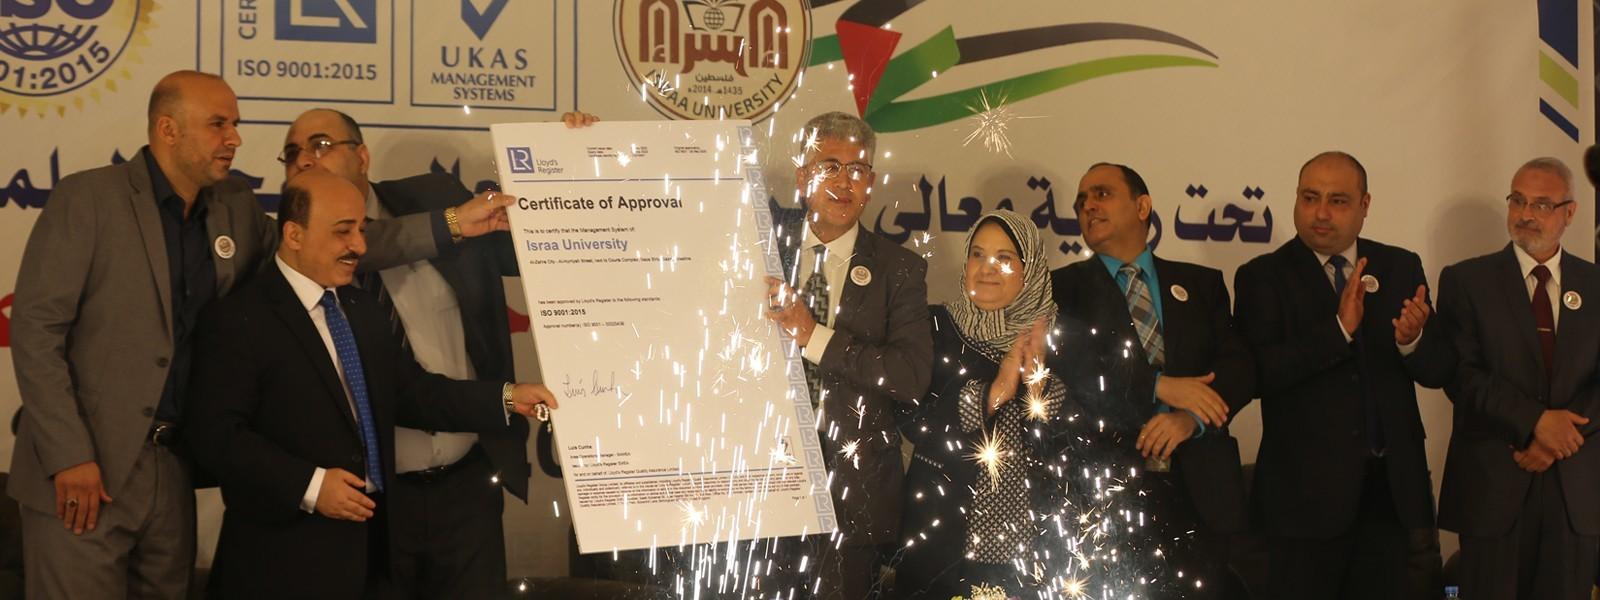 Israa Celebrates International Quality Certificate, ISO:9001:2015